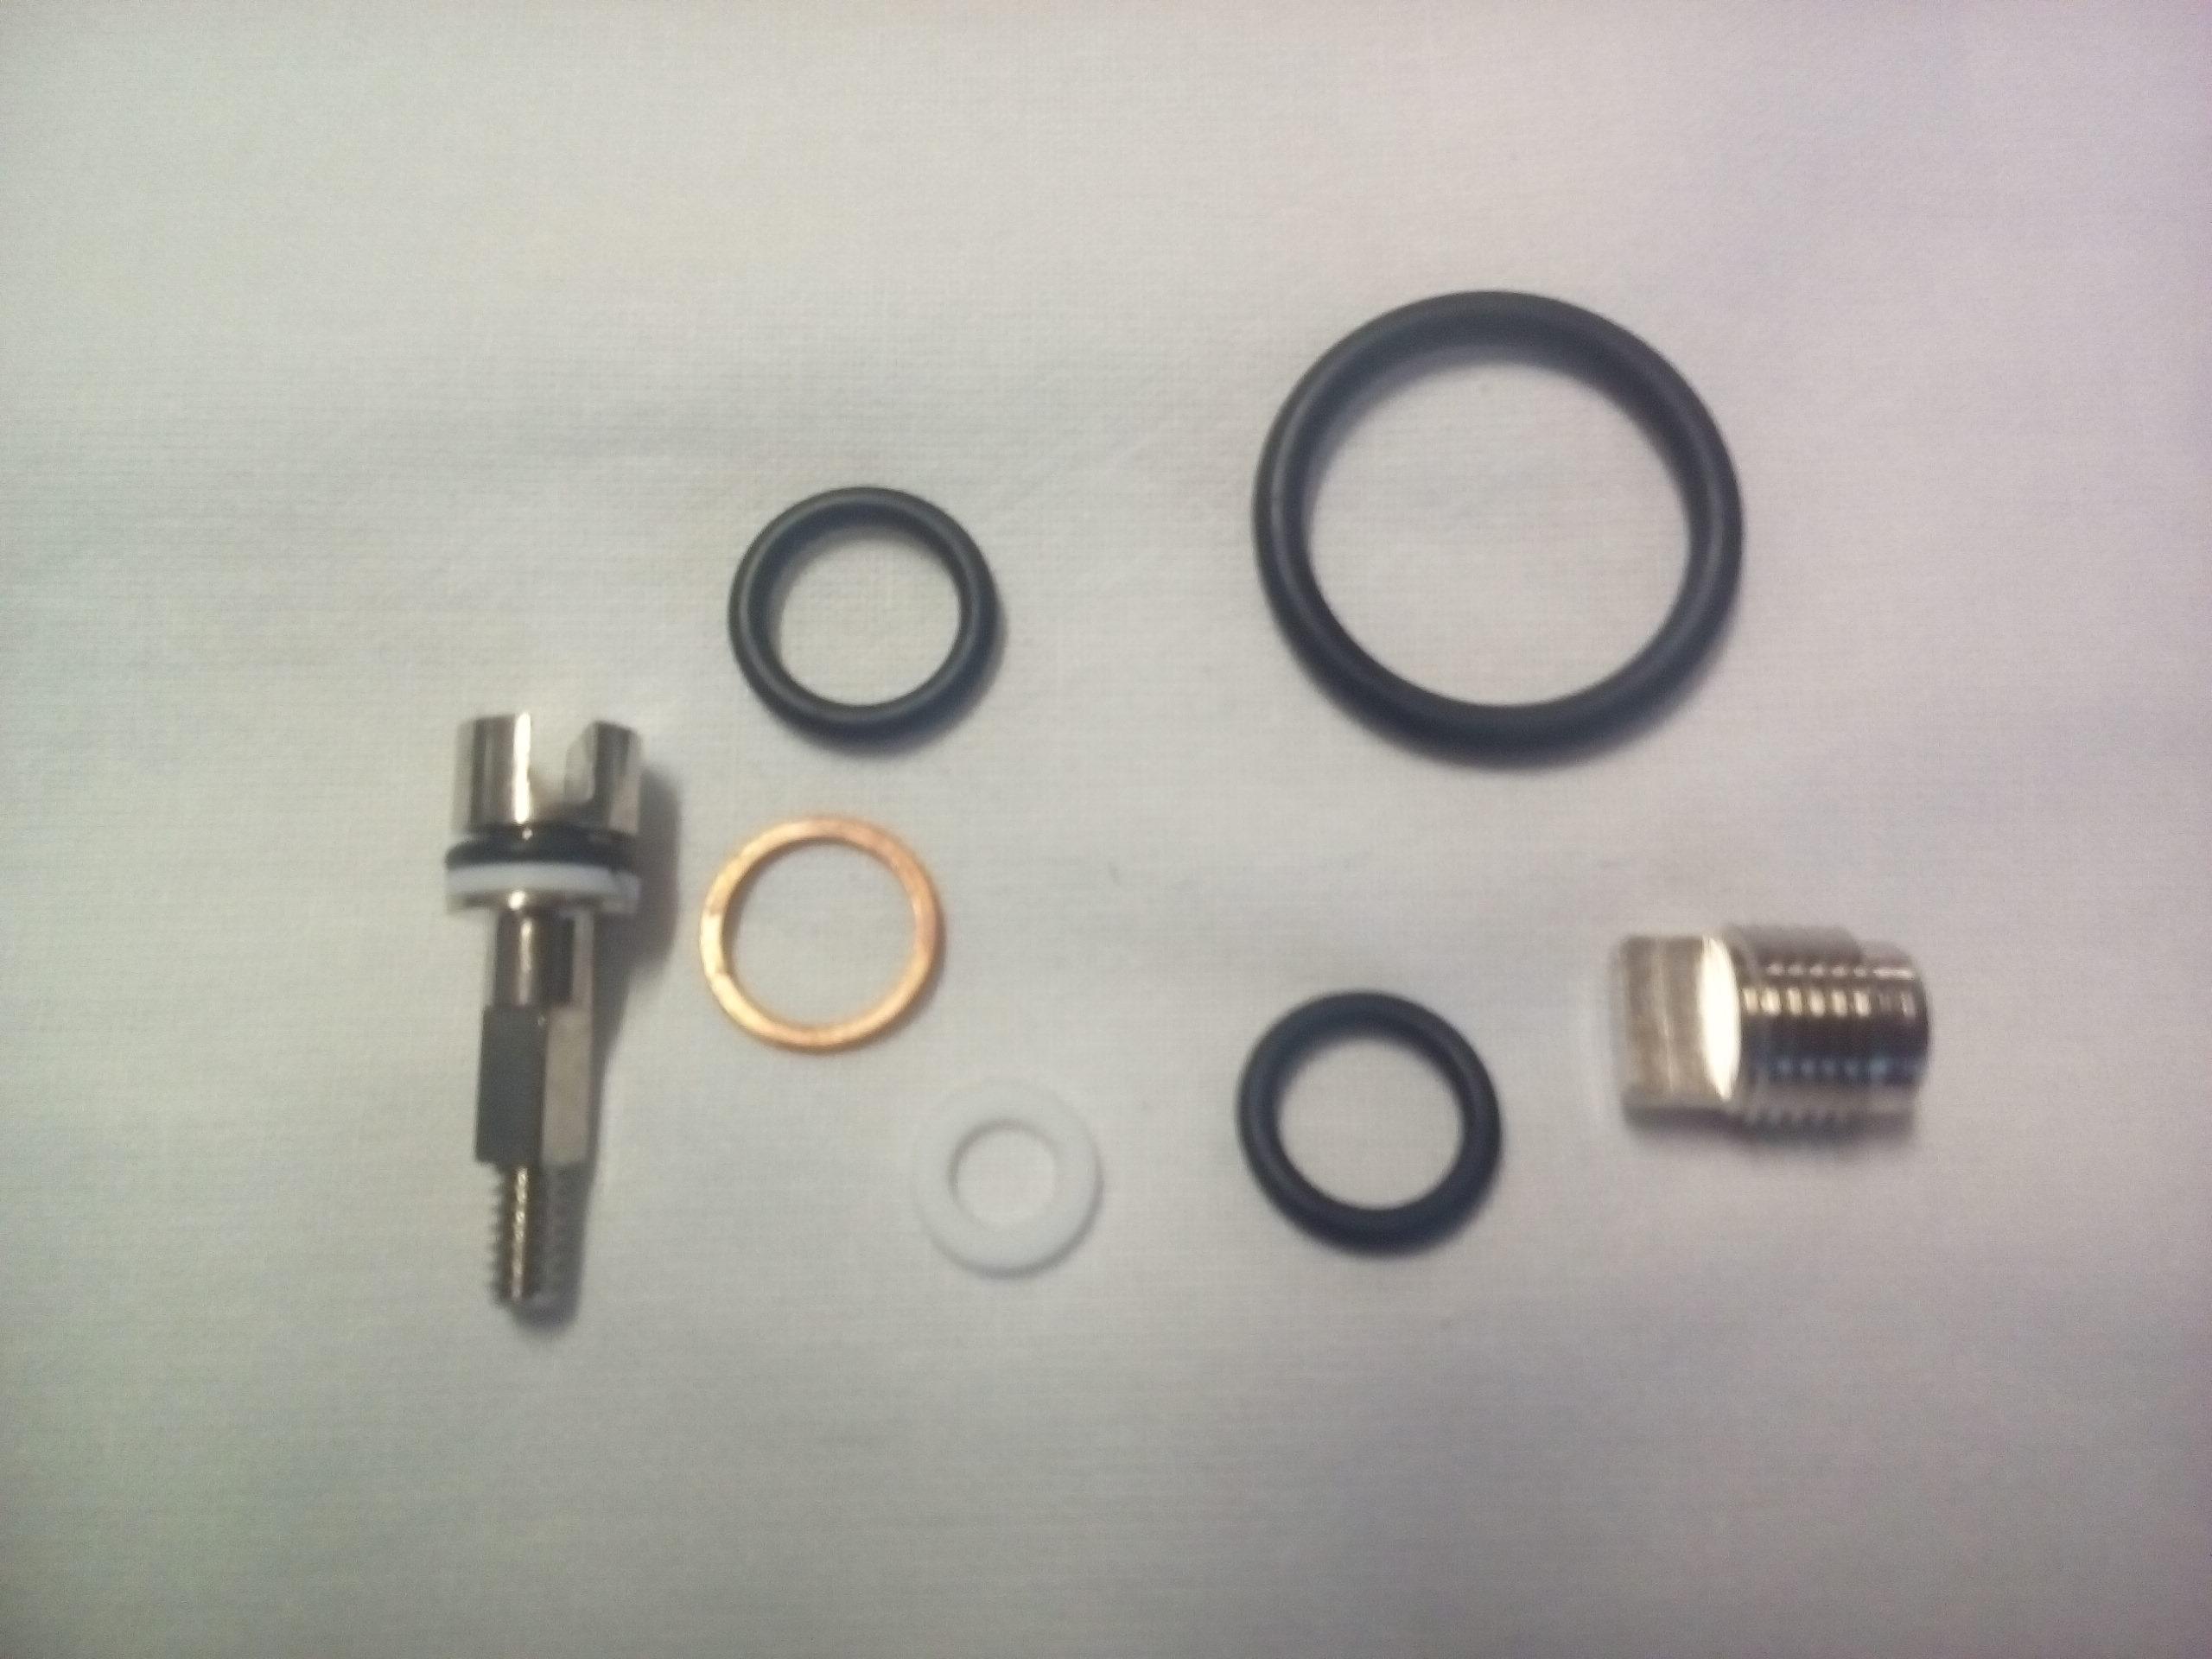 3dd94774f69 Комплект резервни части за един. кран - Комплект резервни части за ...